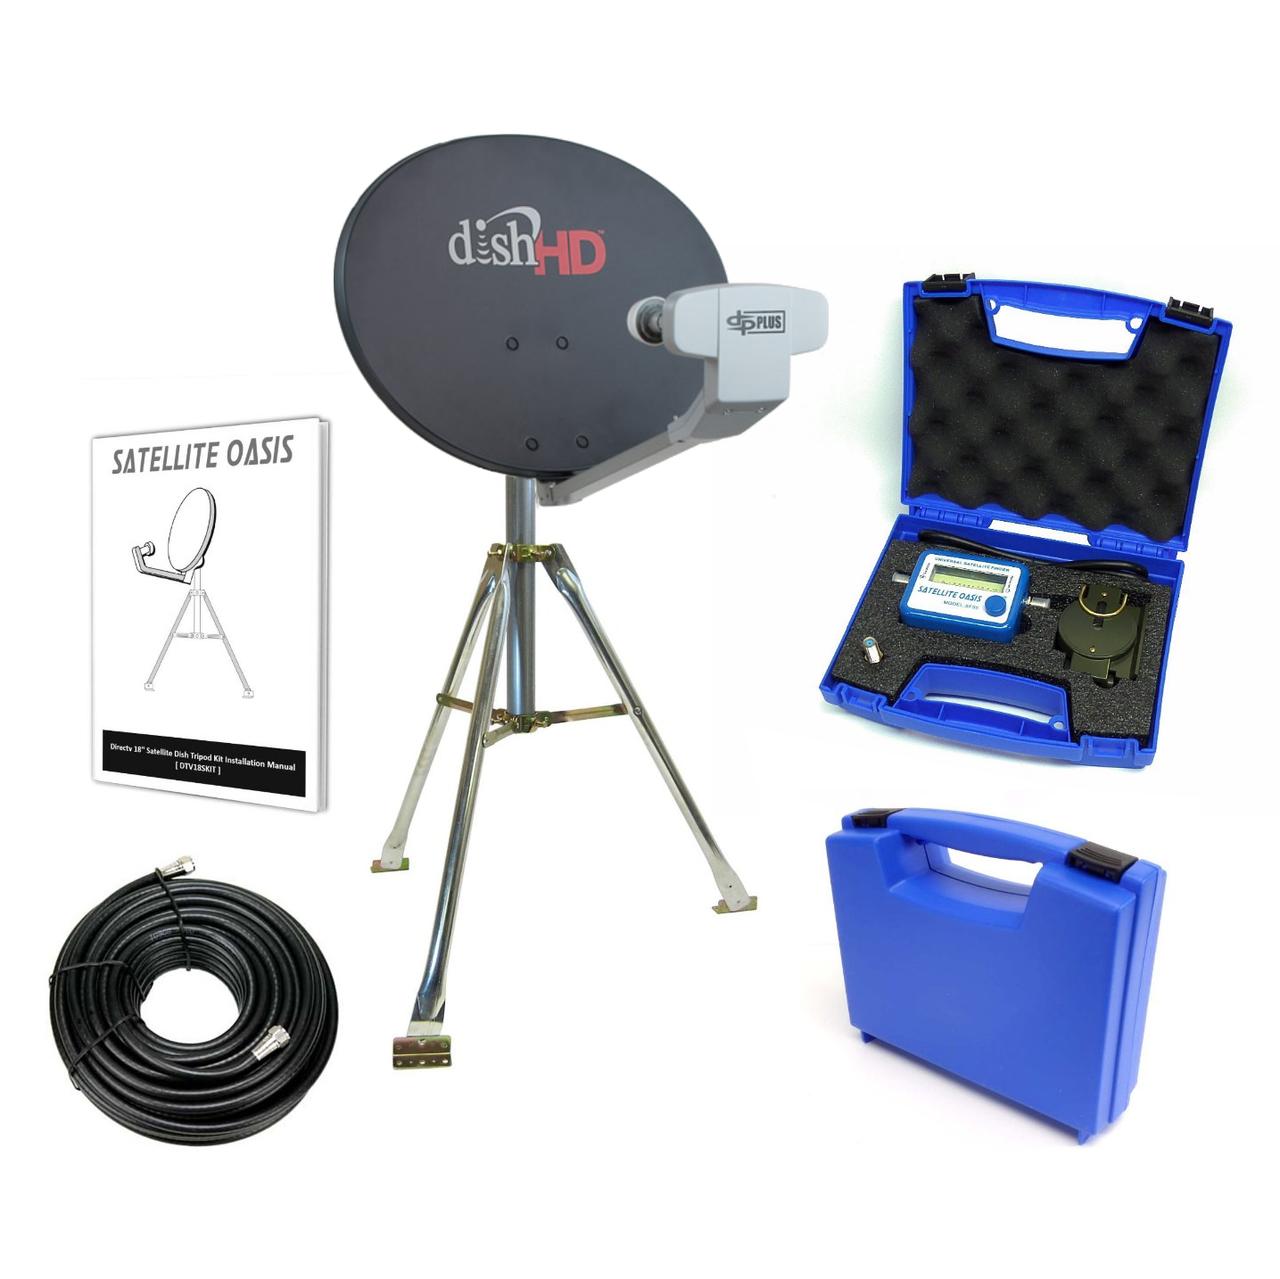 dish network 1000 2 turbo hdtv rv satellite tripod kit